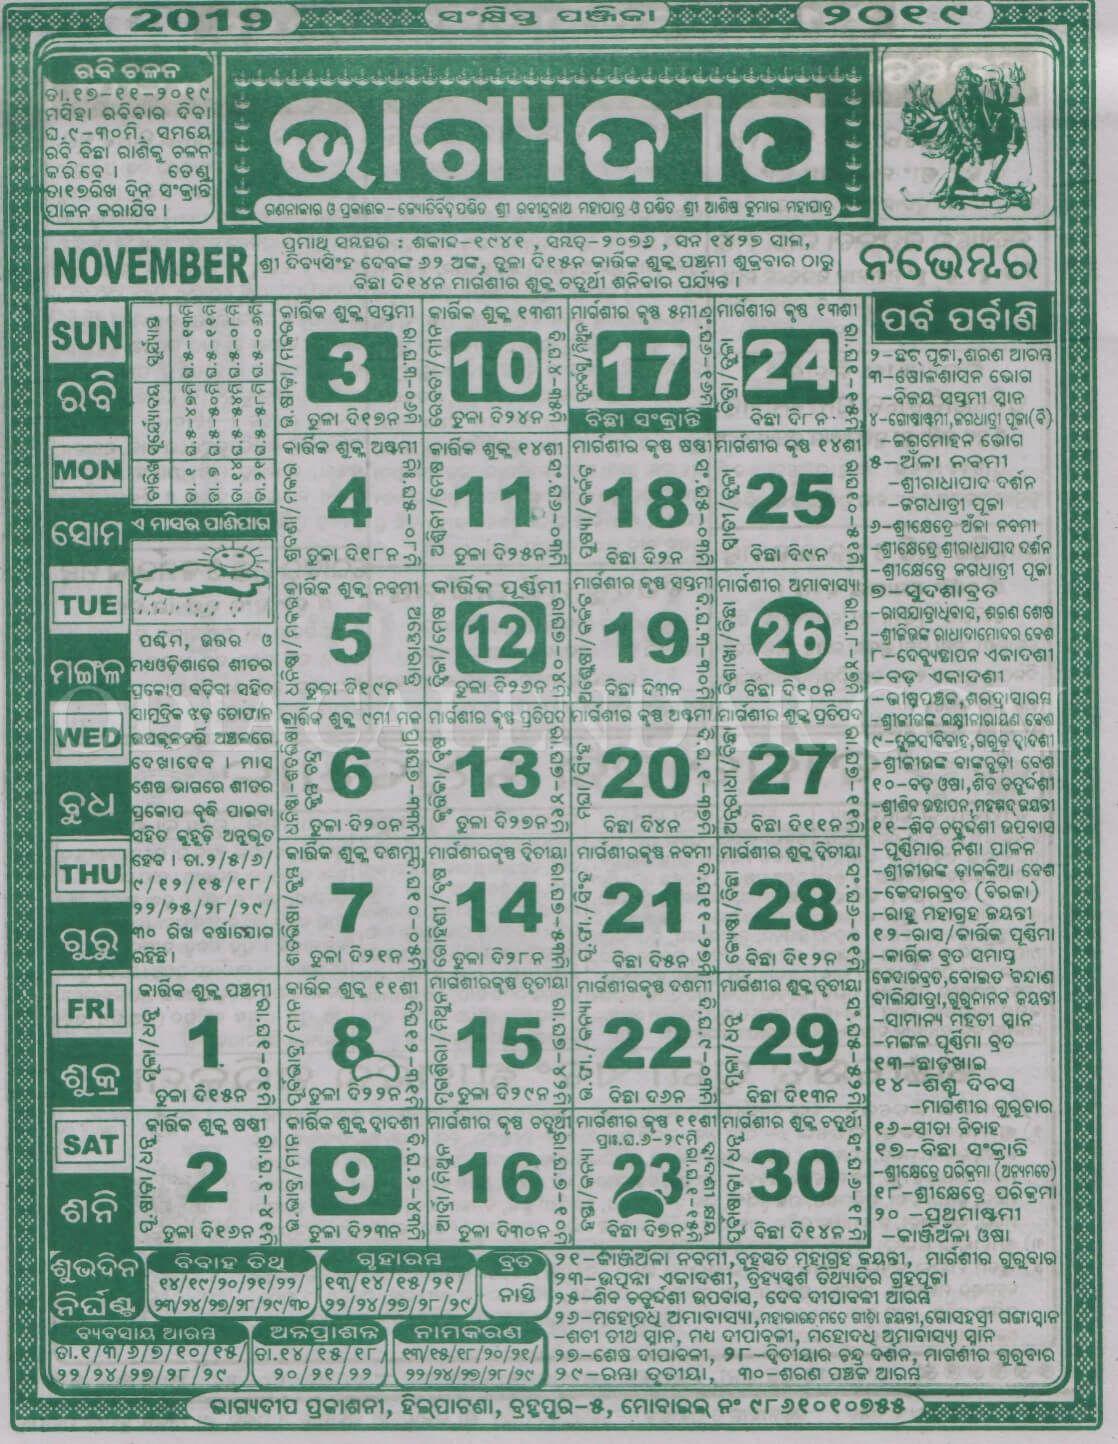 Bhagyadeep Calendar November 2019 | Calendar, High Quality with Bhagyadeep Odia Calendar 2020